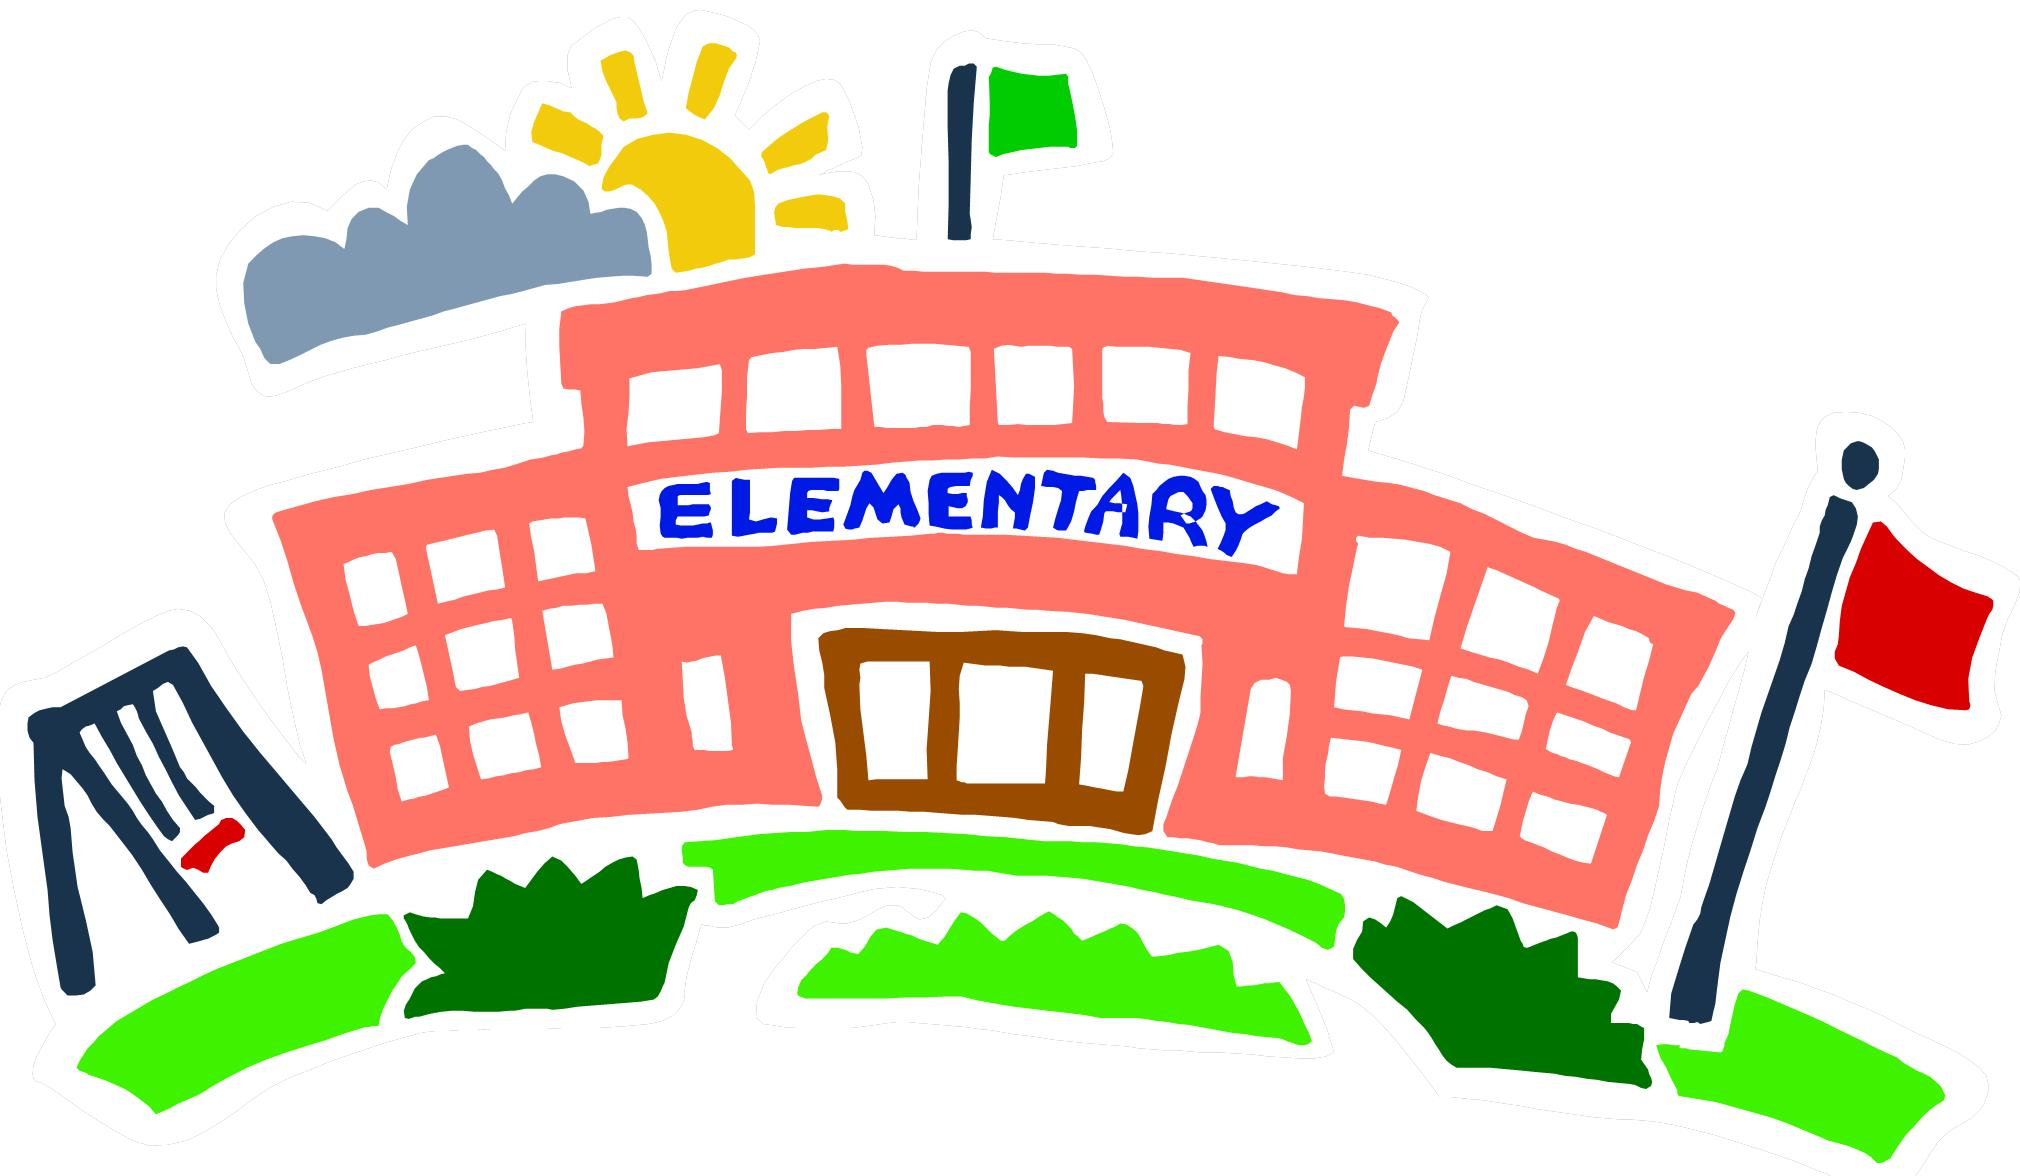 2020x1176 Image Of School Building Clipart 4 College Building Clip Art